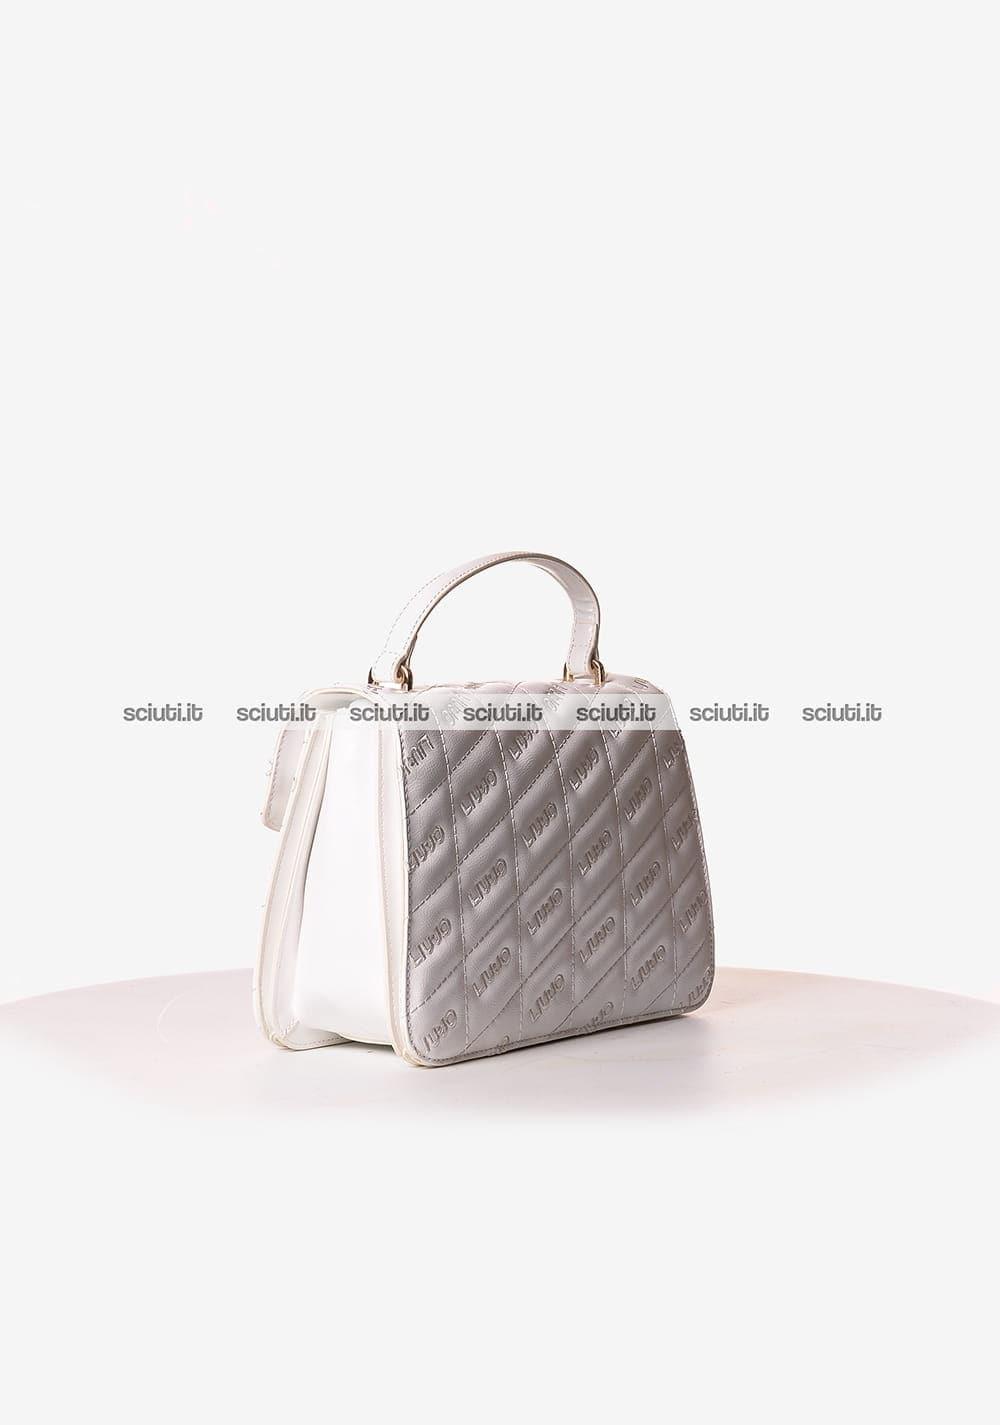 Borsa a mano Liu Jo donna Tiberina logo all over bianco